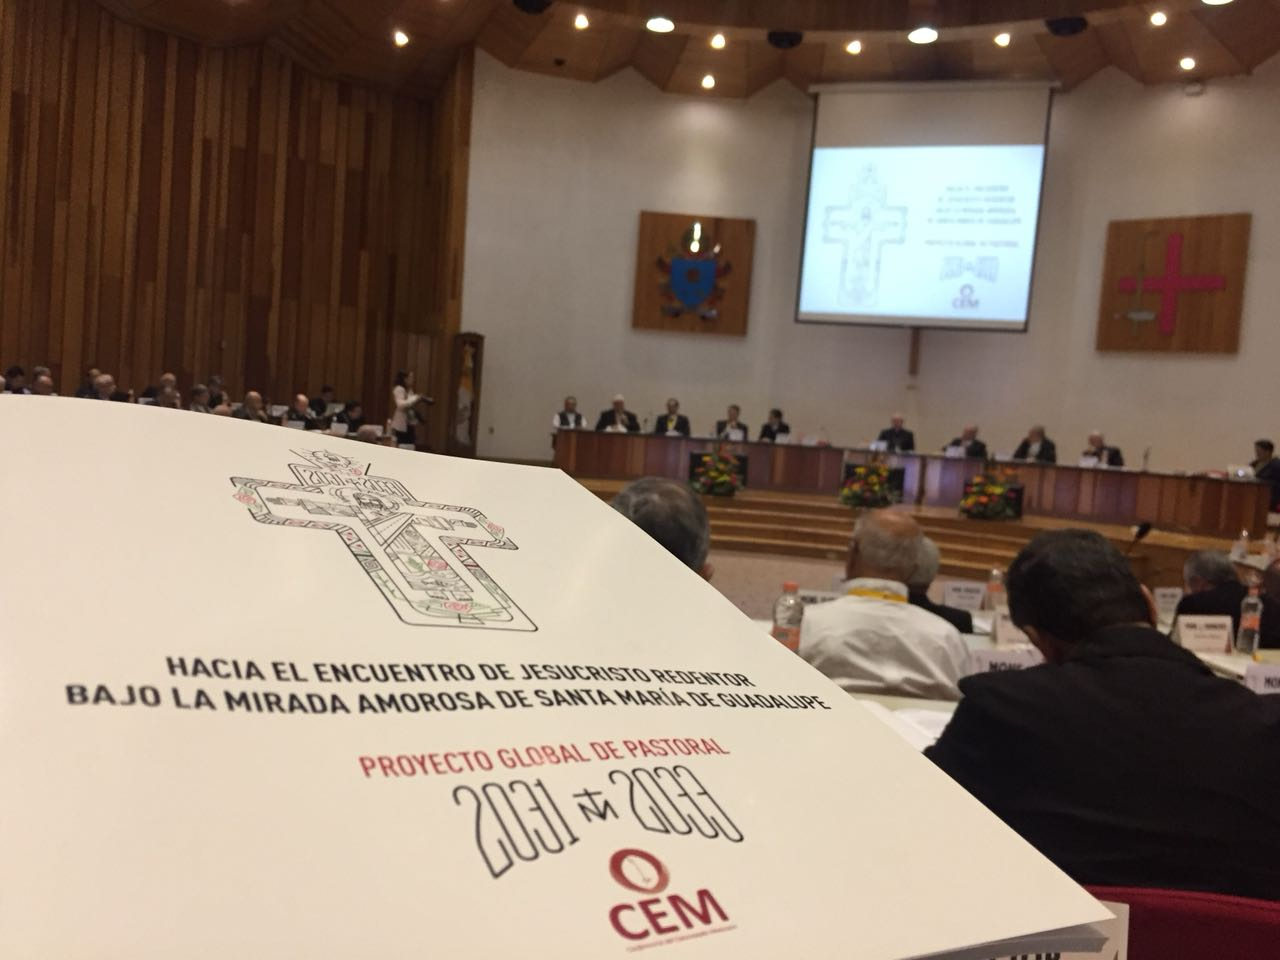 © Vicaria Diocesana de Pastoral